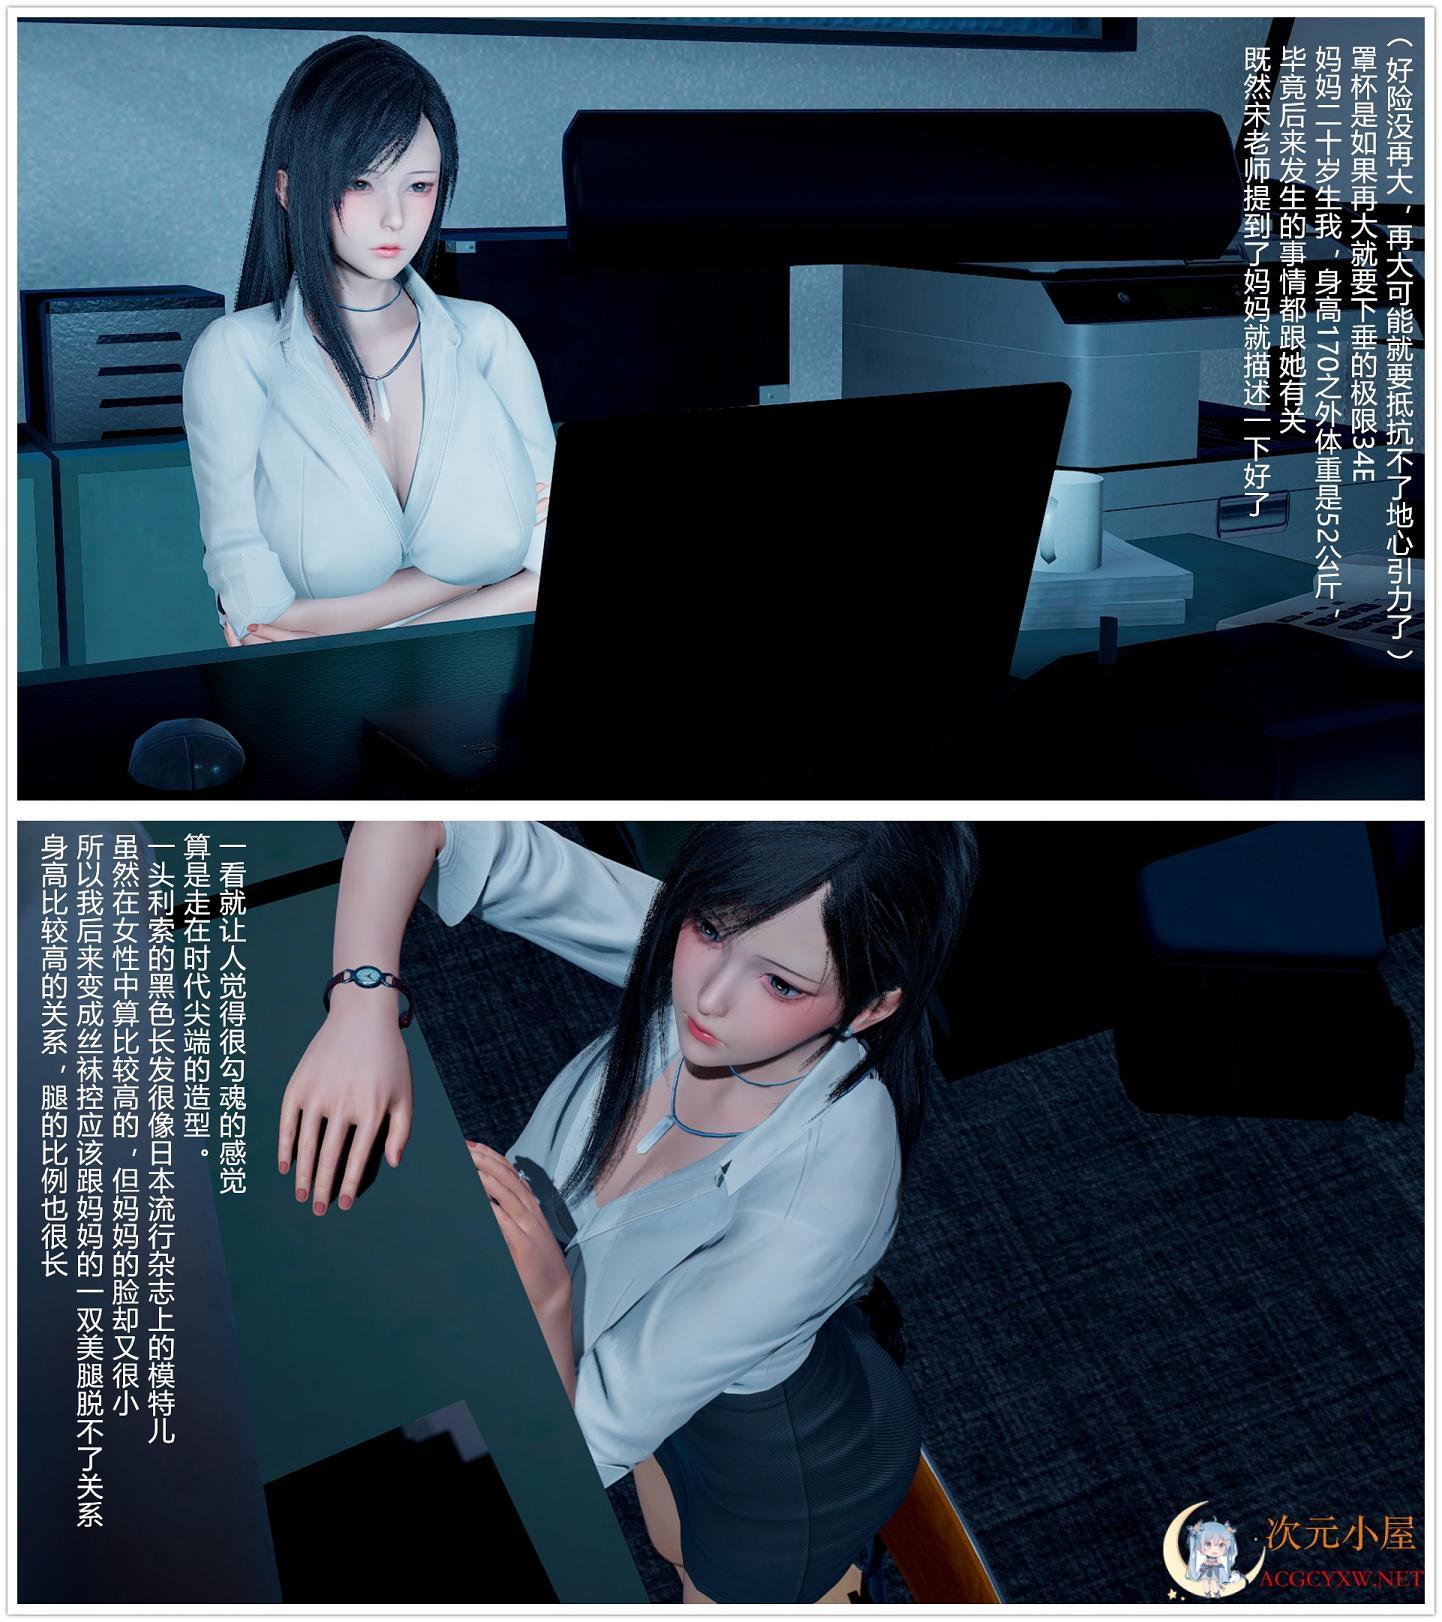 [3D全彩/无修]《背德的裤O袜》01-02 [后宫/女教师][266M] 屠城辅助网www.eyy5.cn4762